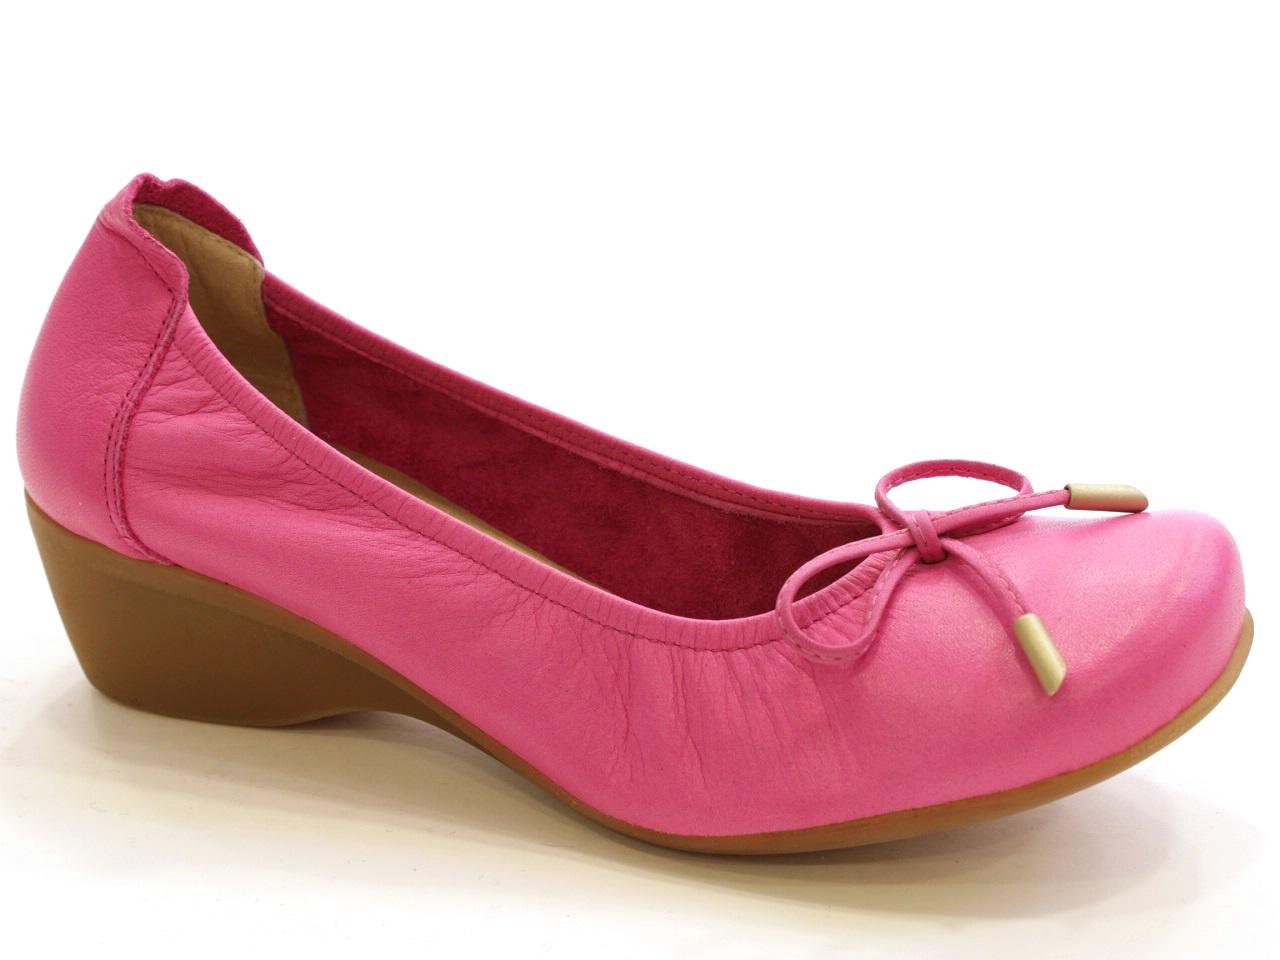 Wedge Shoes Sabrinas - 445 30305